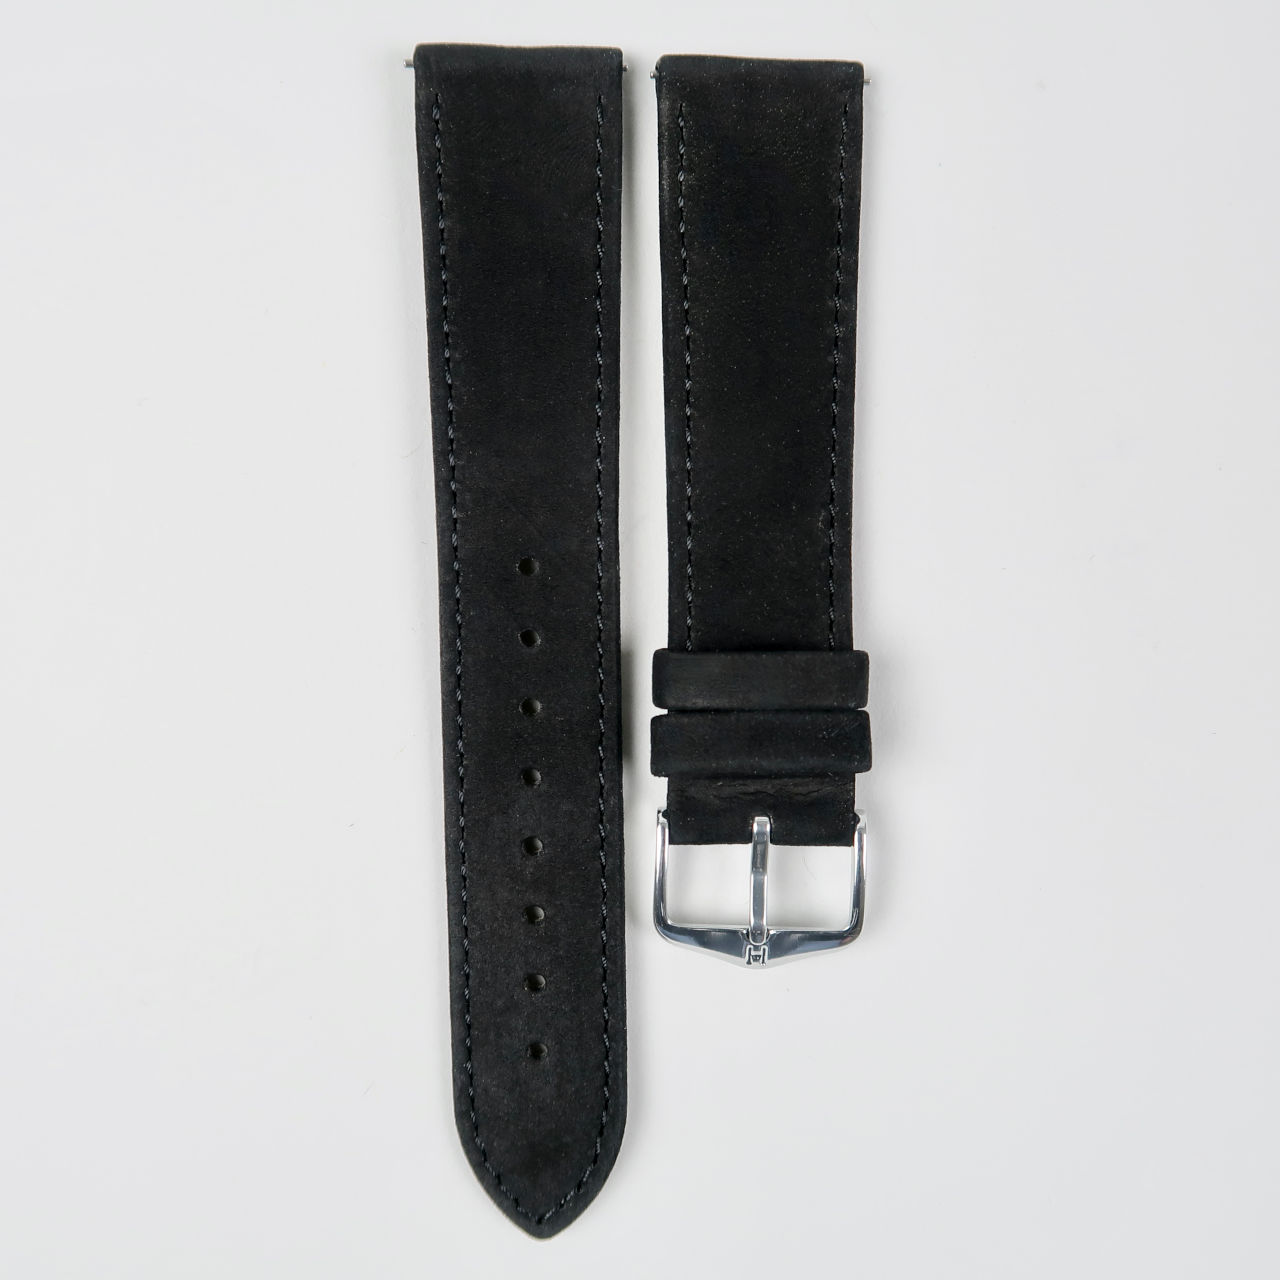 Hirsch Osiris Nubuk black suede finished leather watch straps